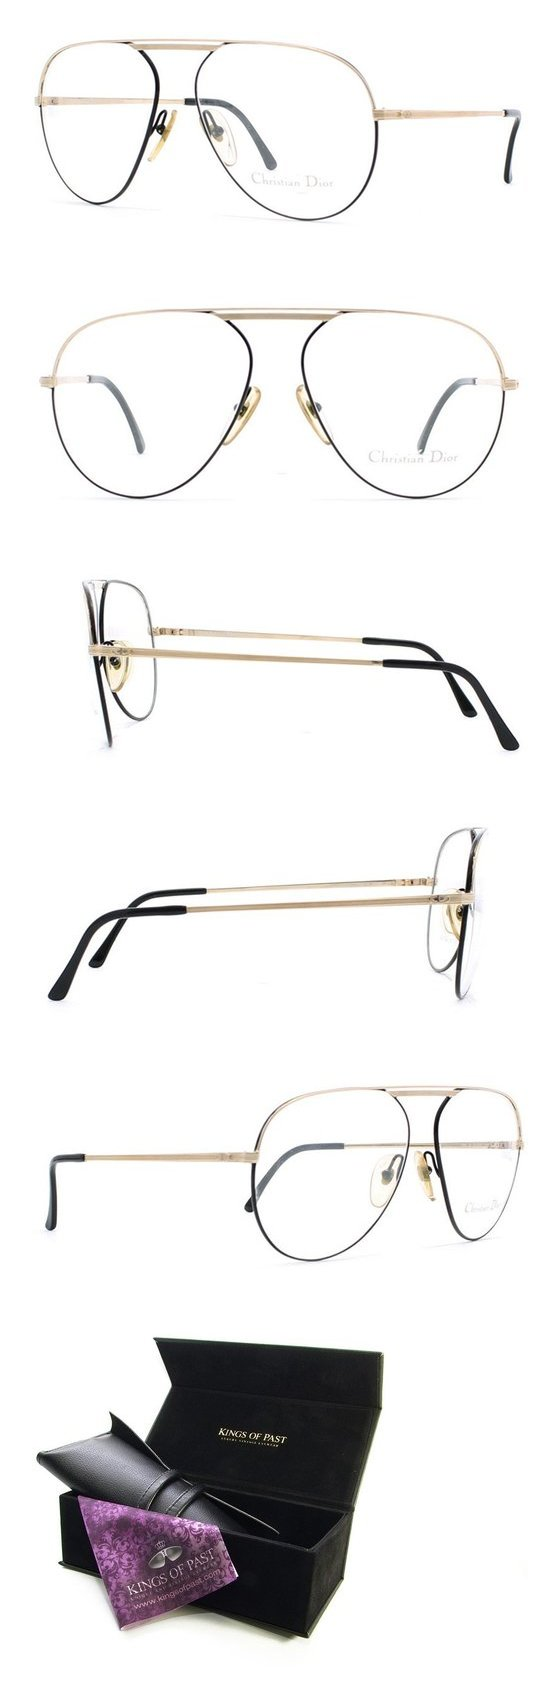 c4c4895013 Christian Dior 2536 49 Black and Gold Authentic Men Vintage Eyeglasses Frame   apparel  eyewear  christiandior  prescription eyewear frames  shops  men    ...